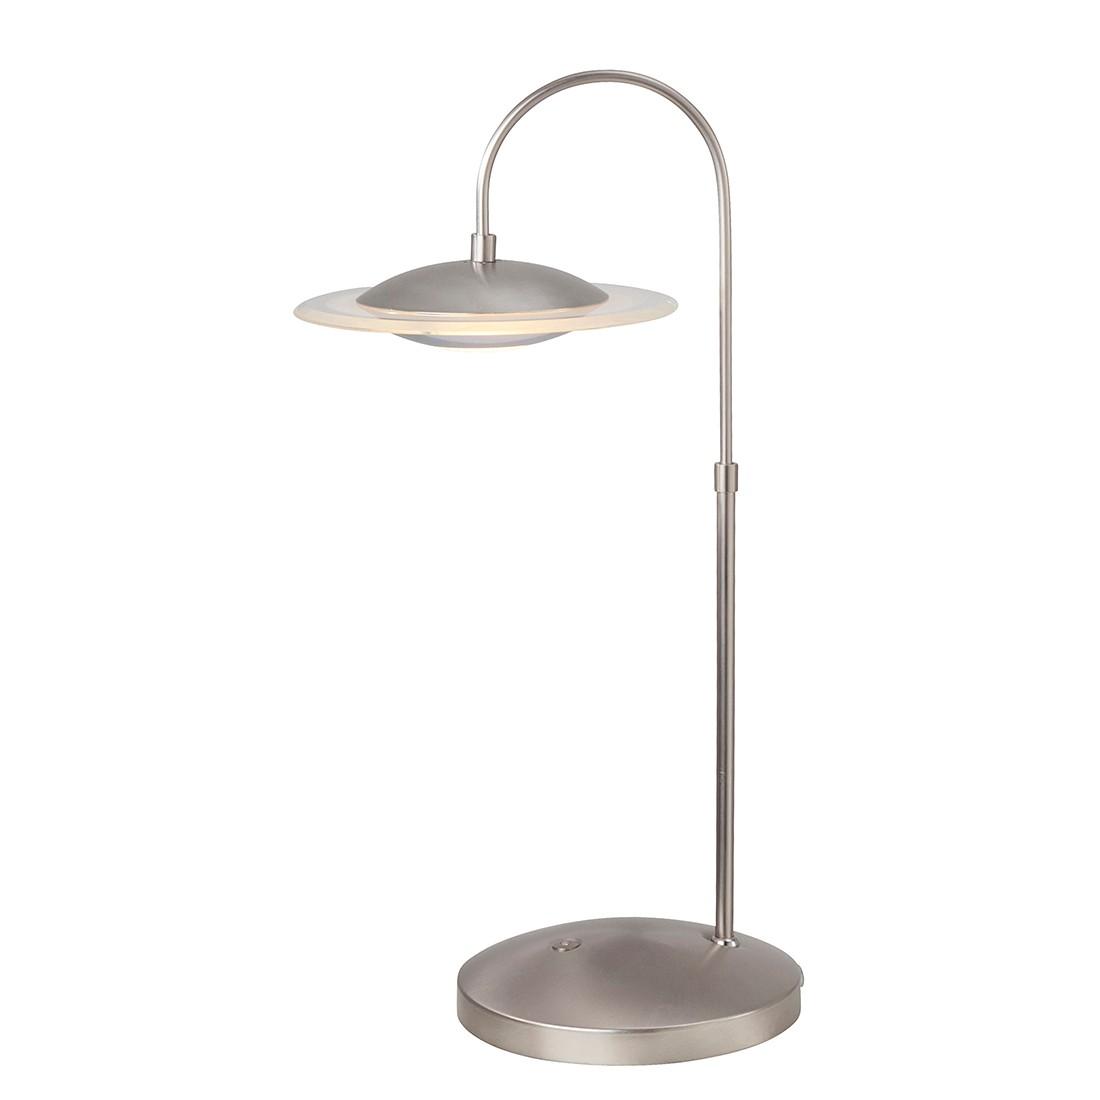 EEK A+, Lampe de table LED Zelena - 1 ampoule Nickel mat, Steinhauer